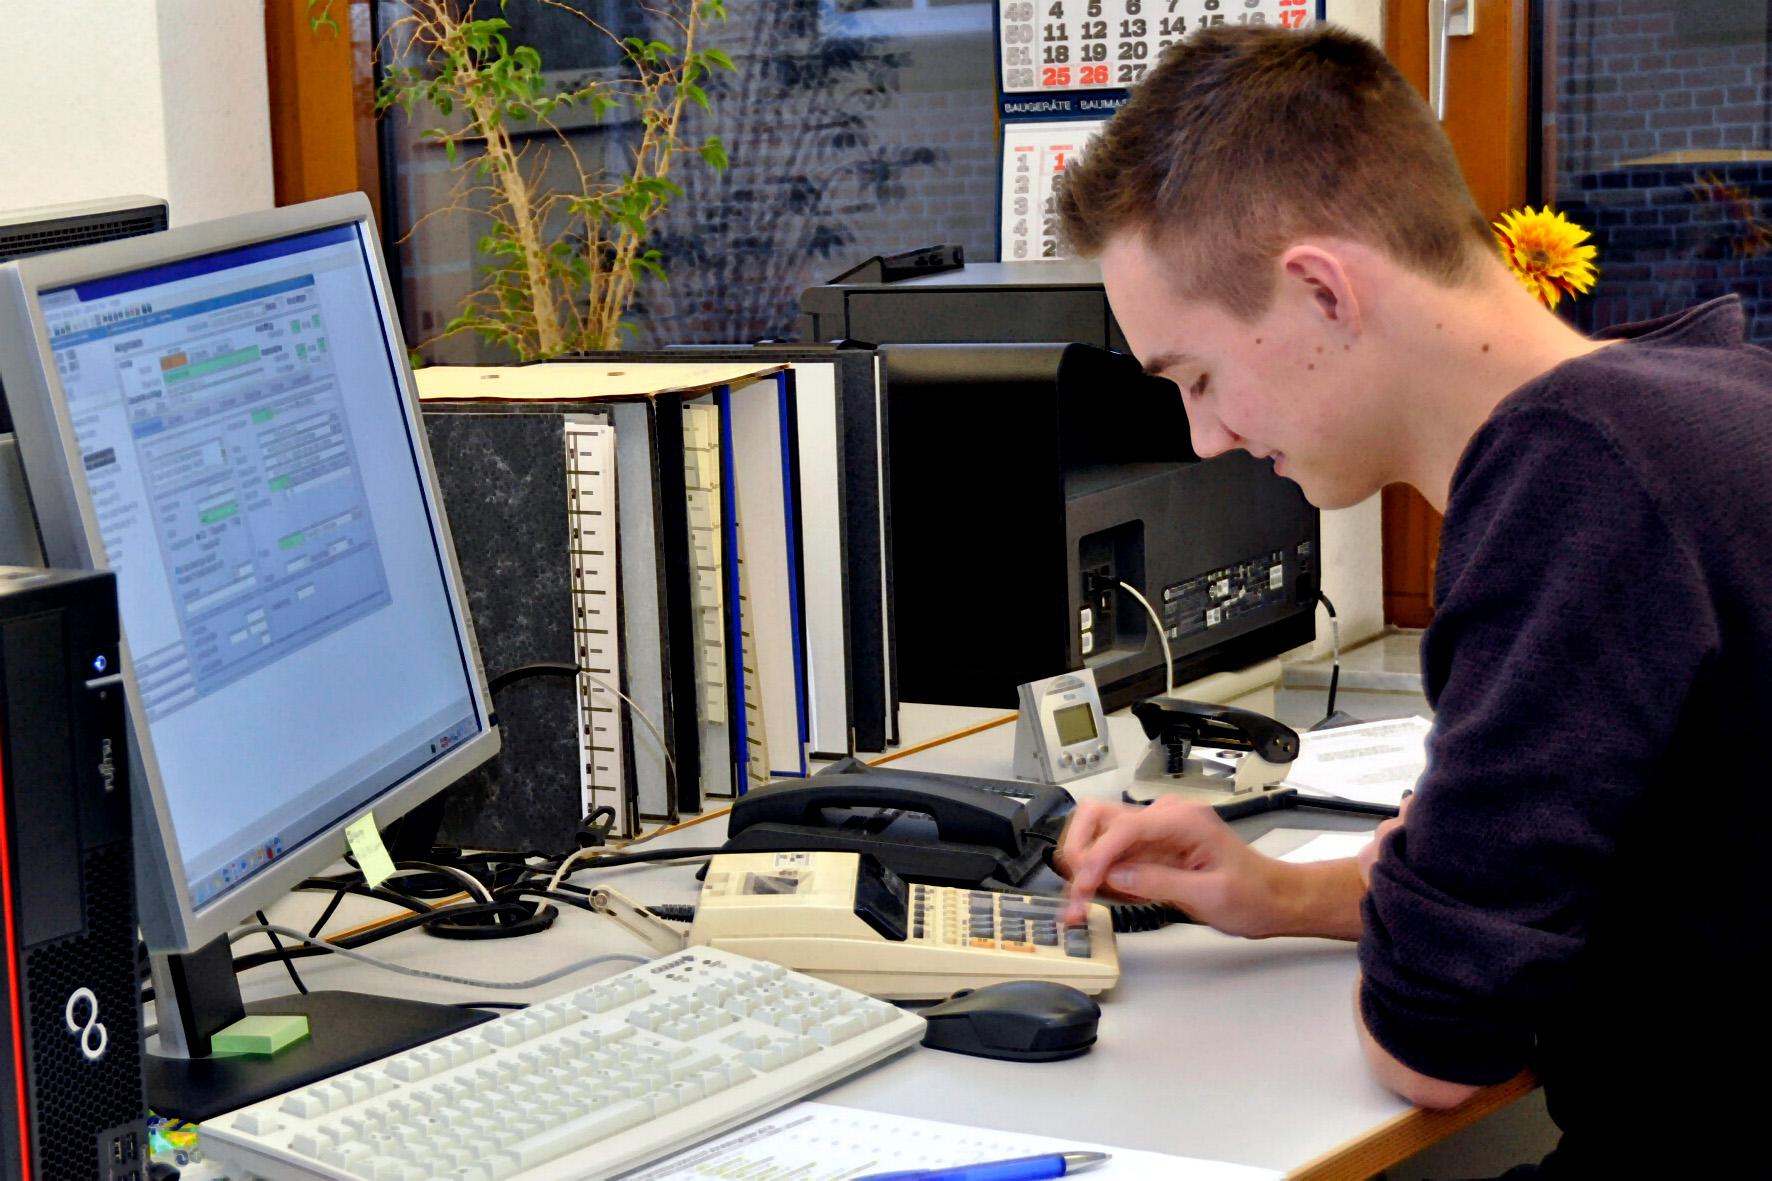 Studiengang Verwaltung